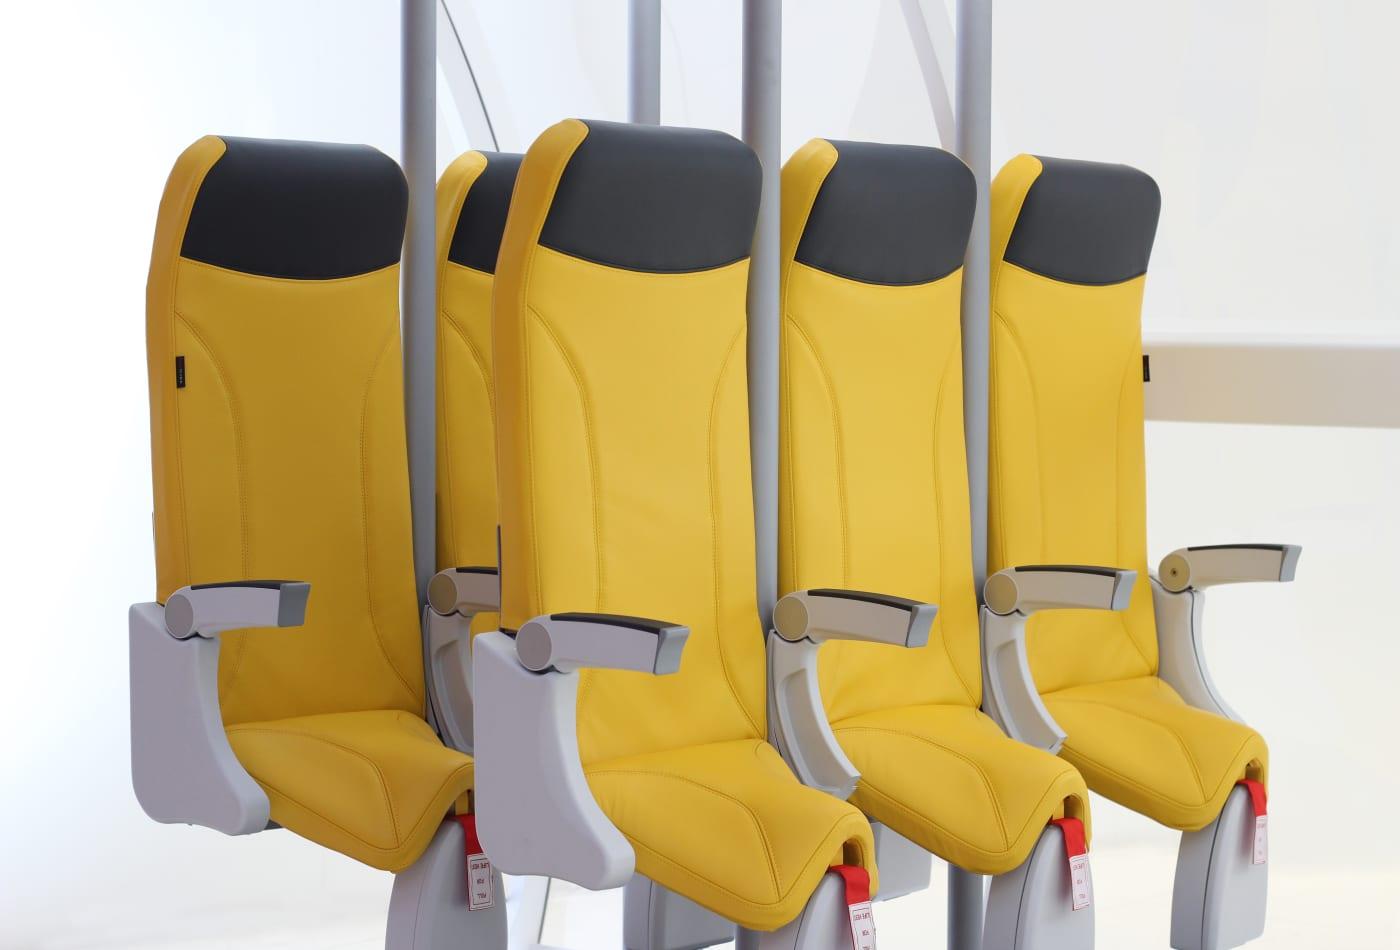 Avioninteriors designed 'standing seats' for airplanes